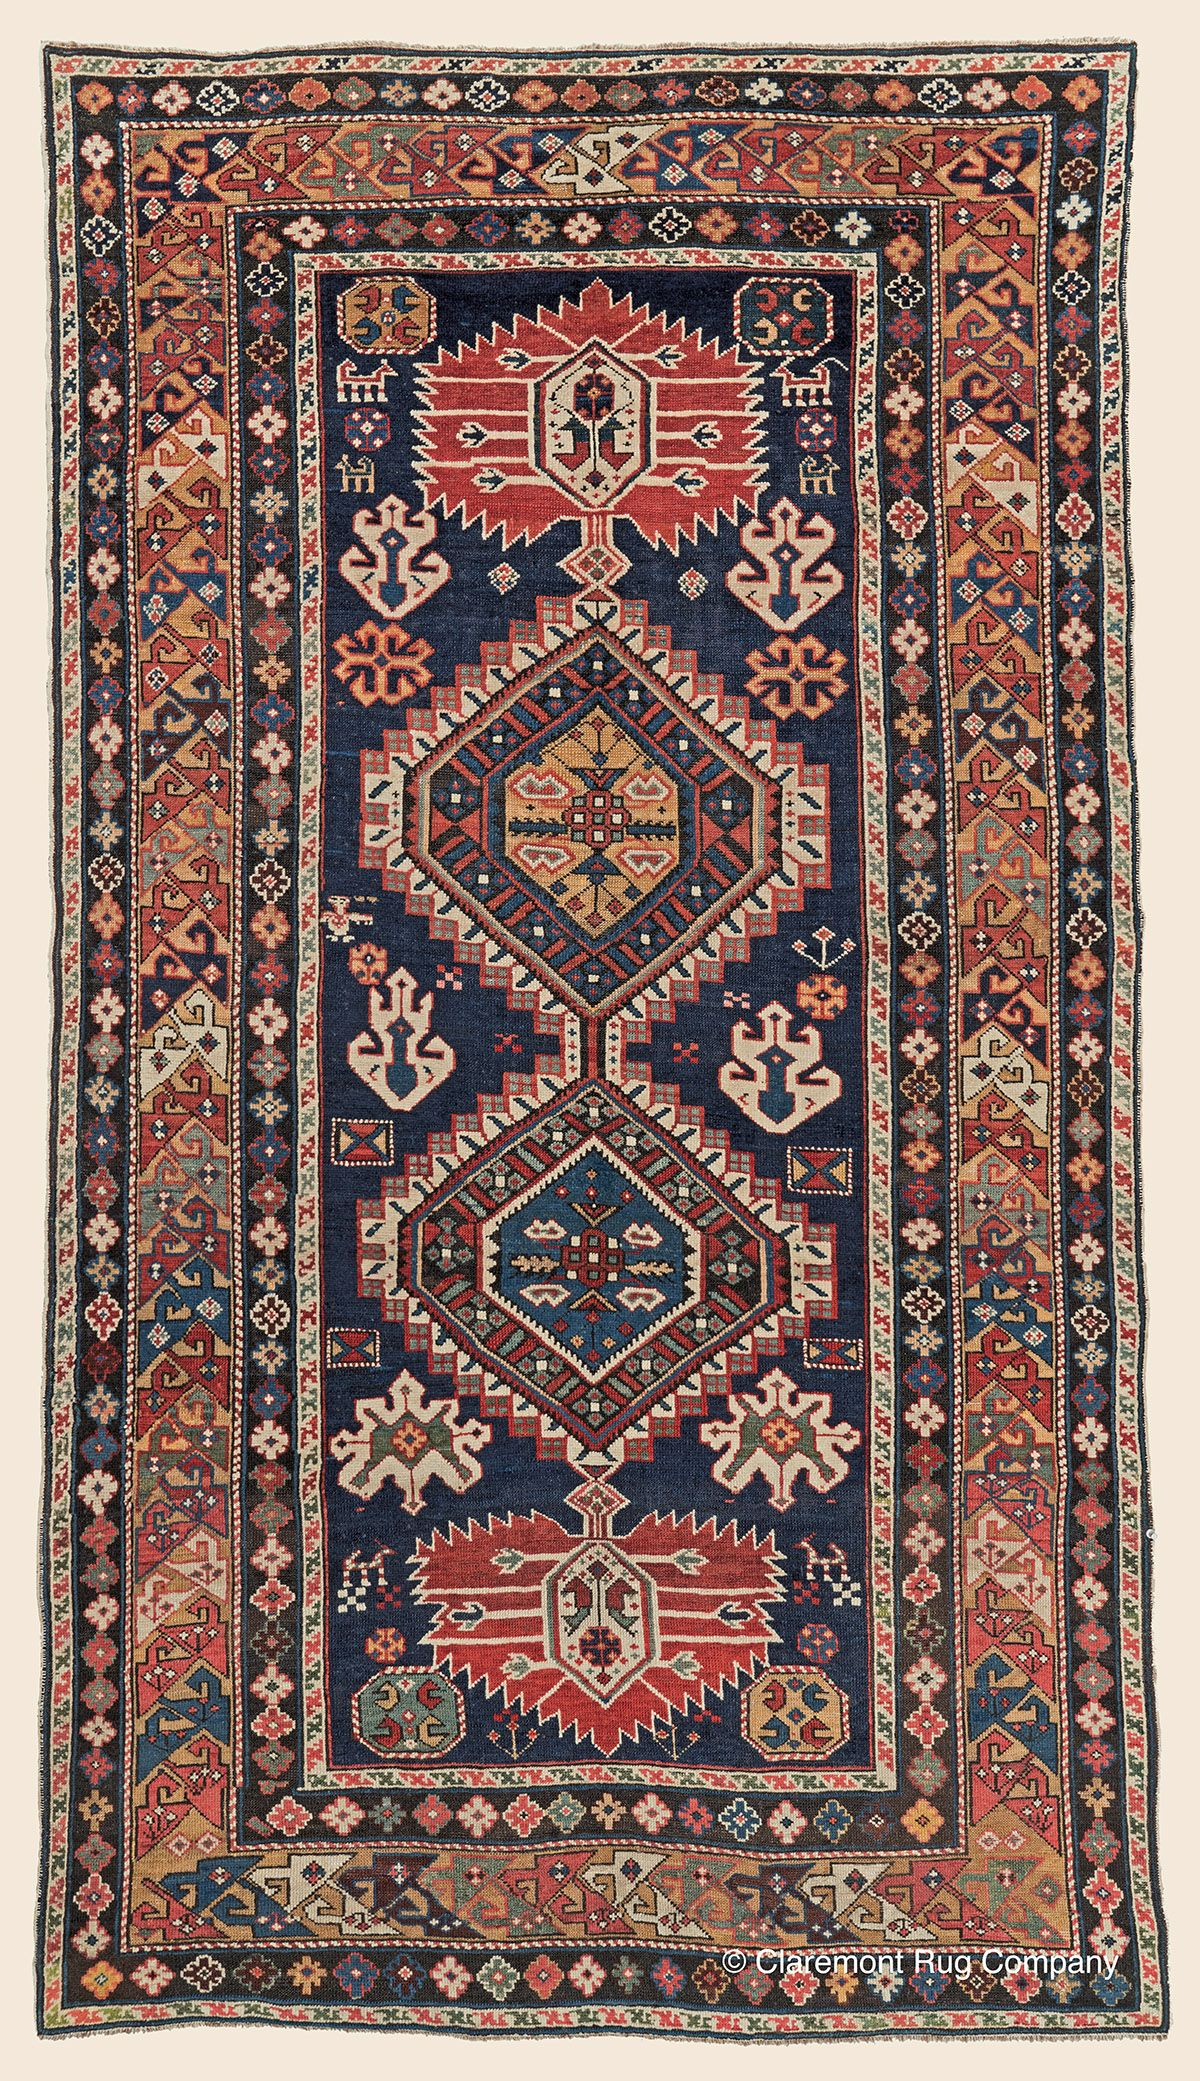 Gubpa Shirvan 4 0 X 6 10 Circa 1850 Southeast Caucasian Antique Rug Claremont Rug Company Click To Le Claremont Rug Company Antique Oriental Rugs Rugs